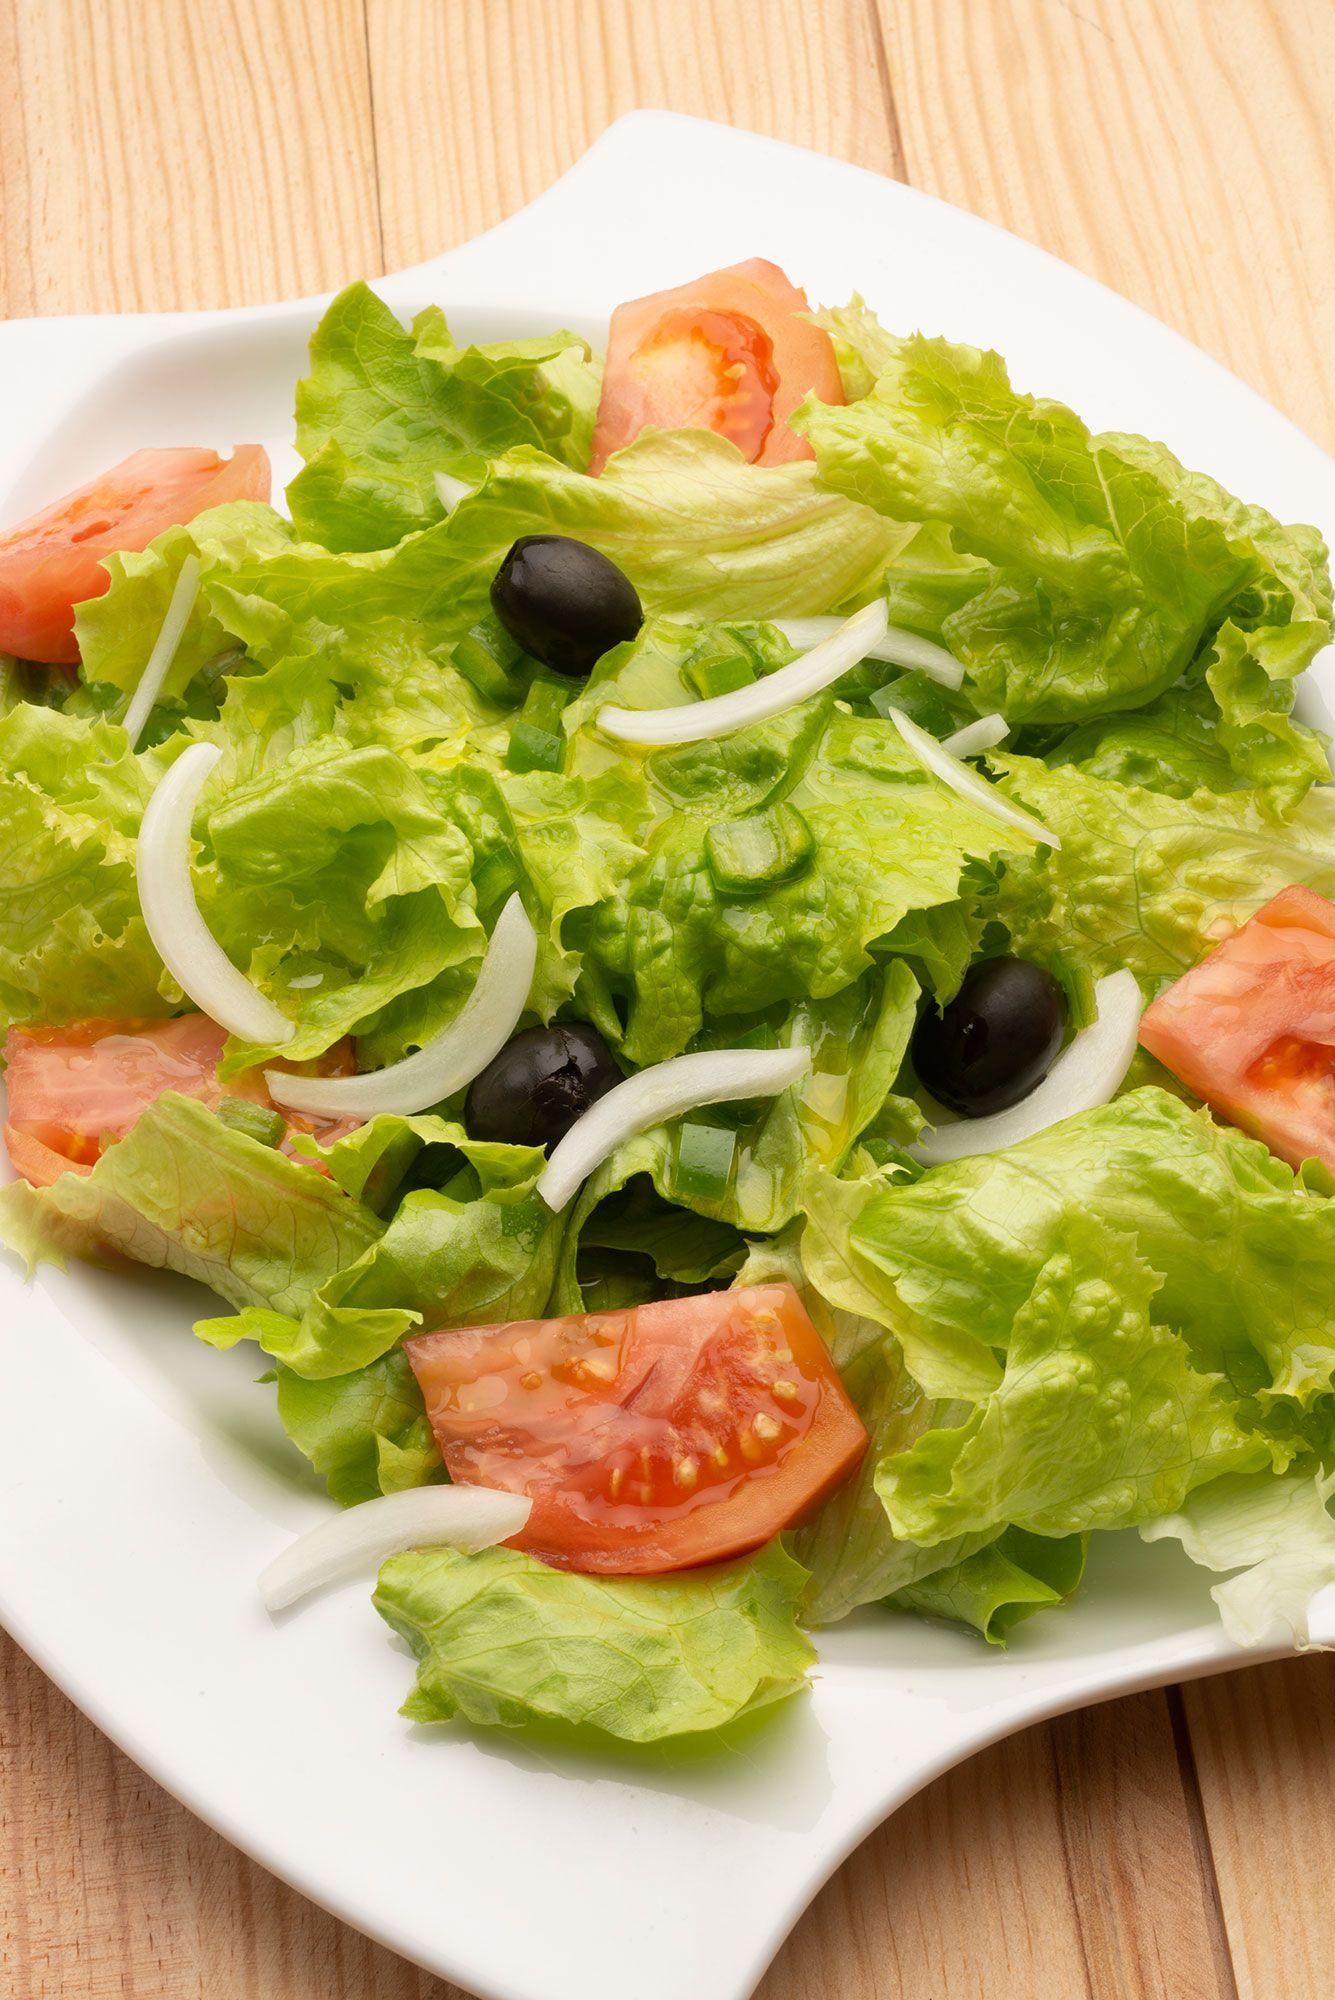 Ensalada de lechuga, tomate y aceitunas negras